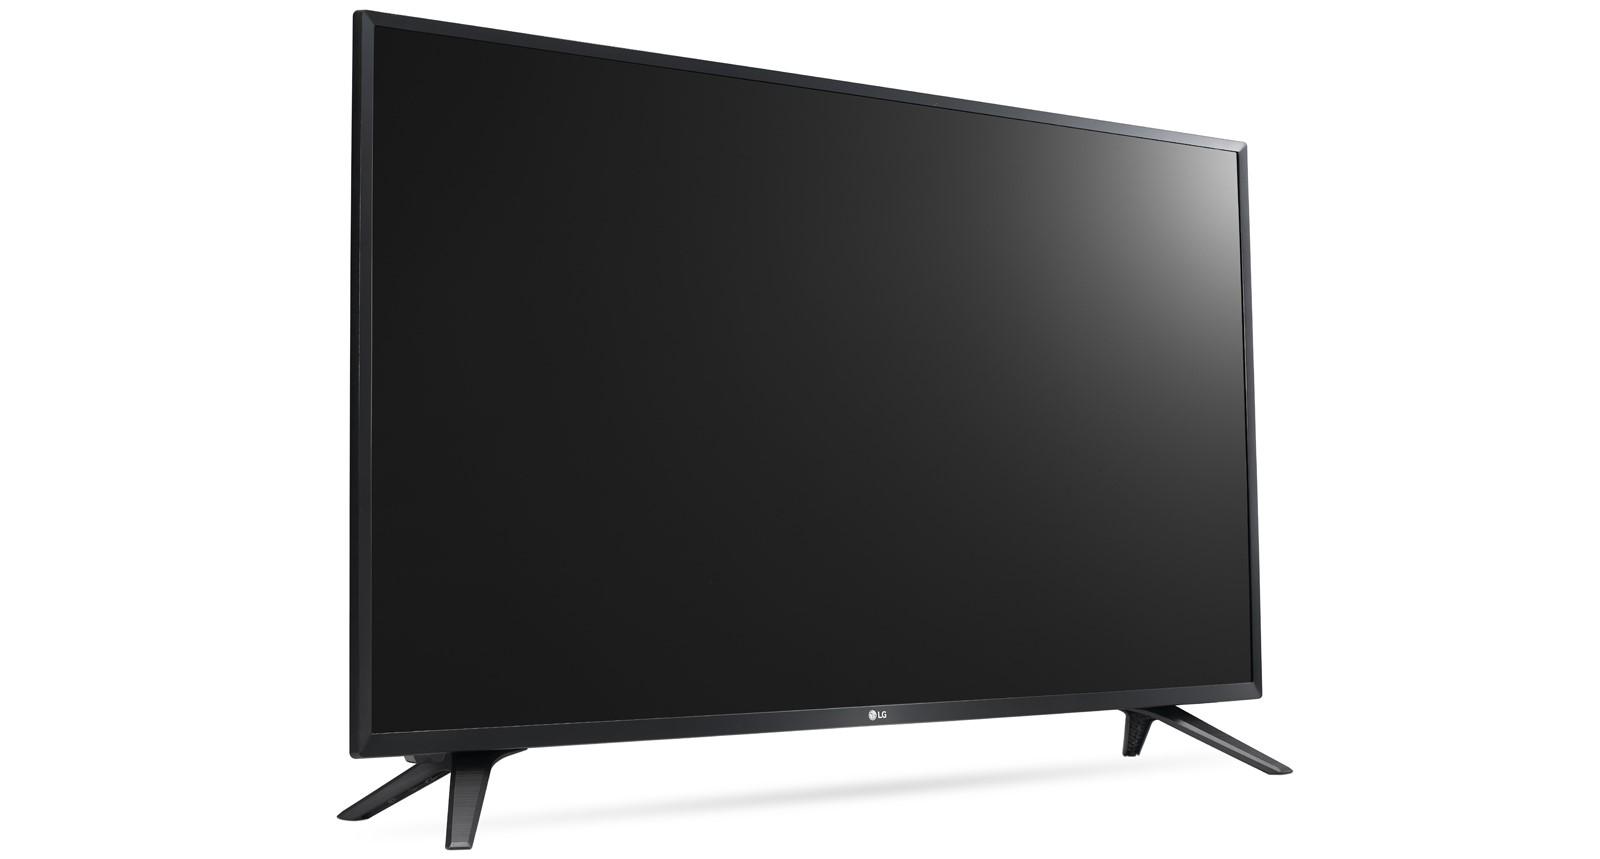 Tivi LG 43 inch Full HD 43LV300C